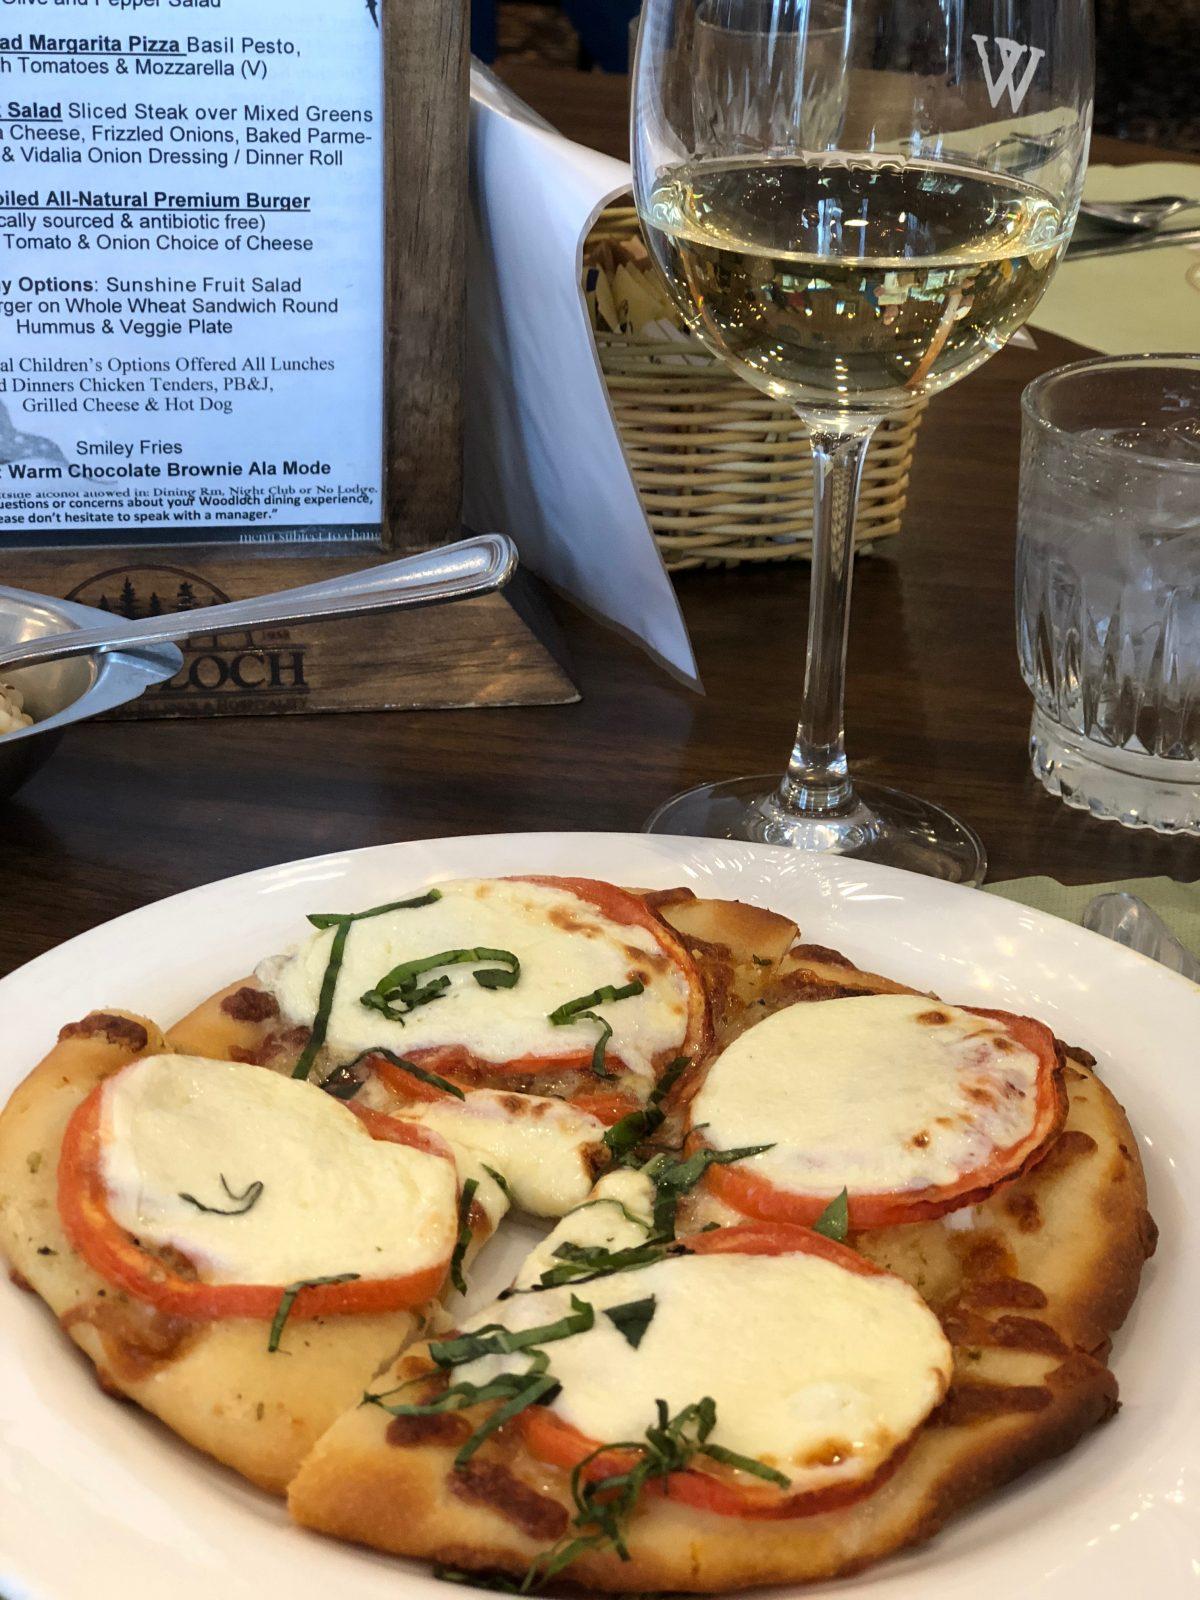 Fresh mozzarella tomato basil flatbread with glass of wine Woodloch Pines Resort in Pocono Mountains